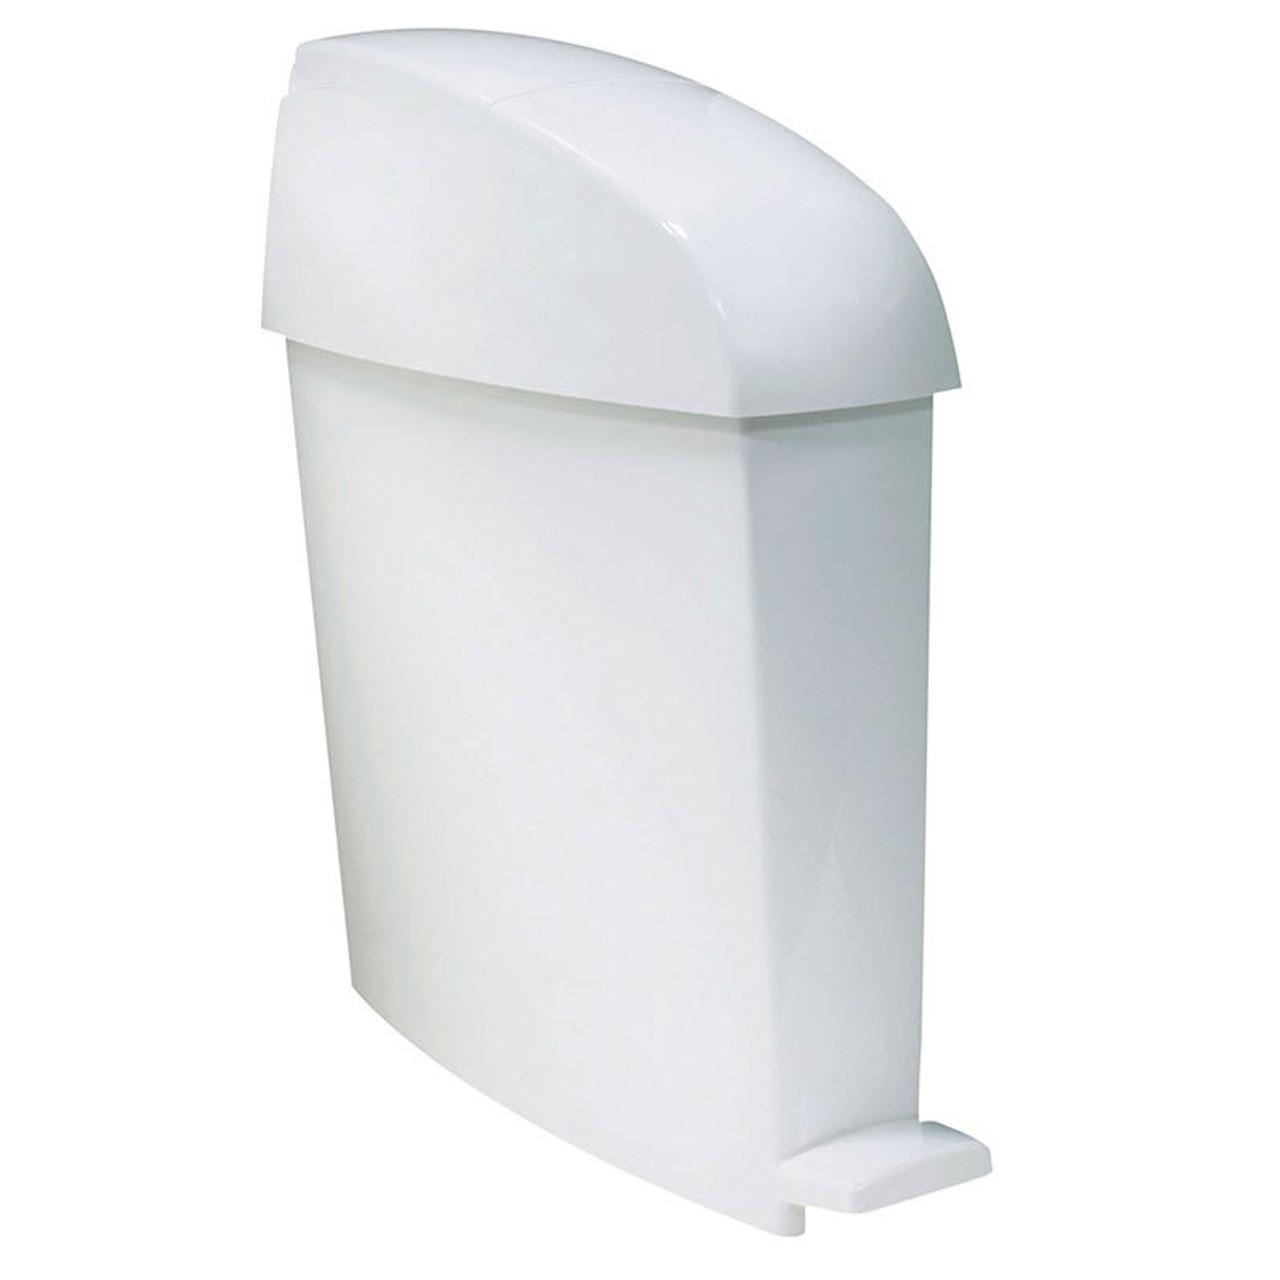 Rubbermaid San1Ped 20L Capacity Pedal-Operated Bin - White - 580X490X155mm - FG402338